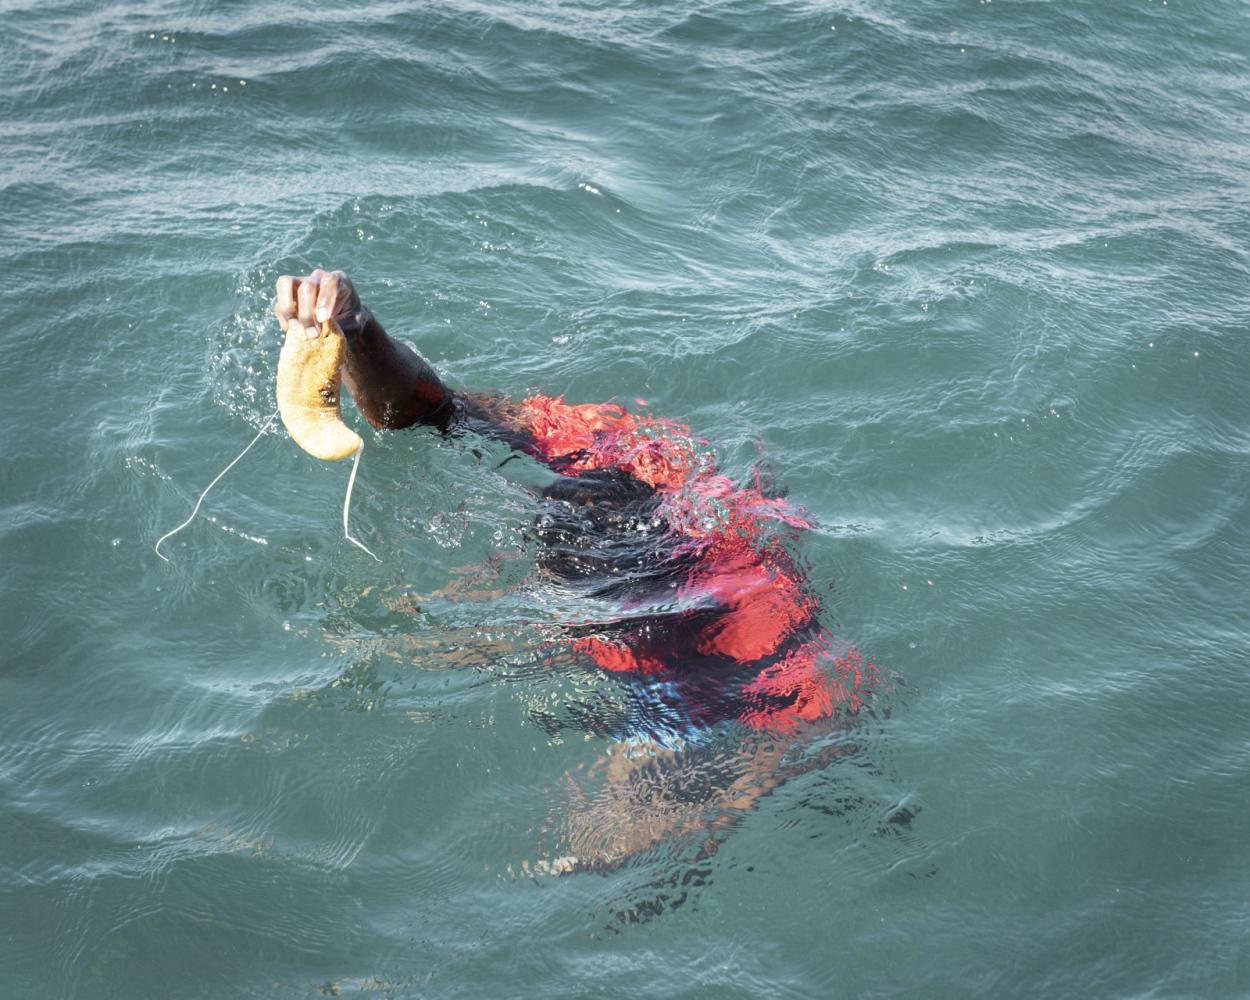 A divers retrieves a Sea Cucumber.